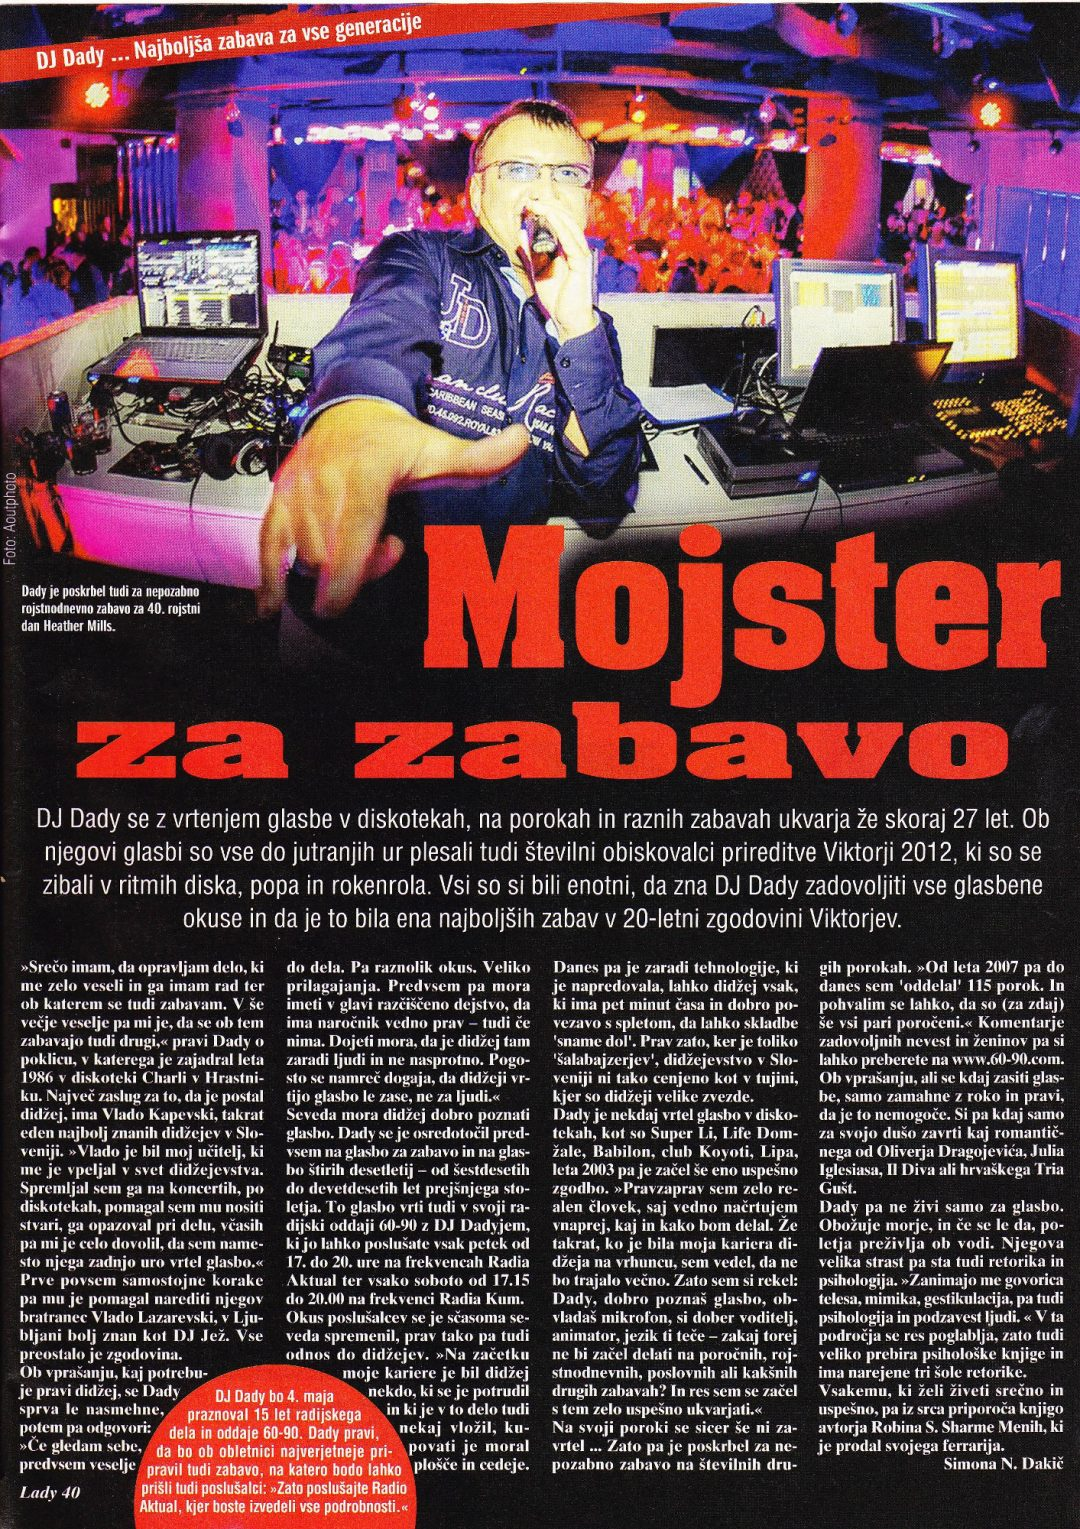 DJ Dady – mojster za zabavo (revija Lady)